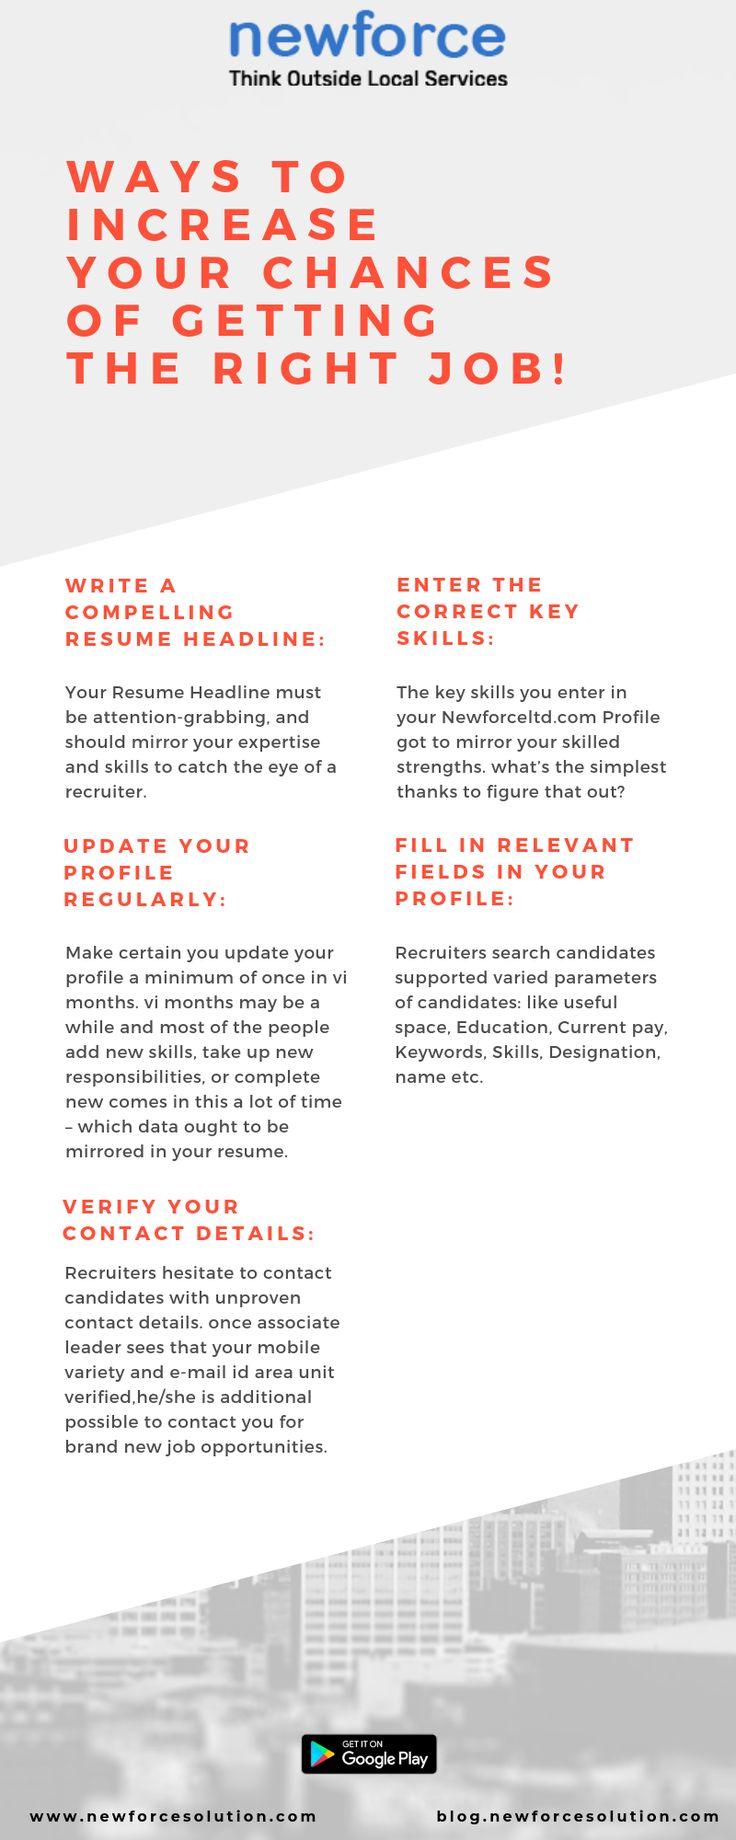 Write a compelling Resume Headline Your Resume Headline